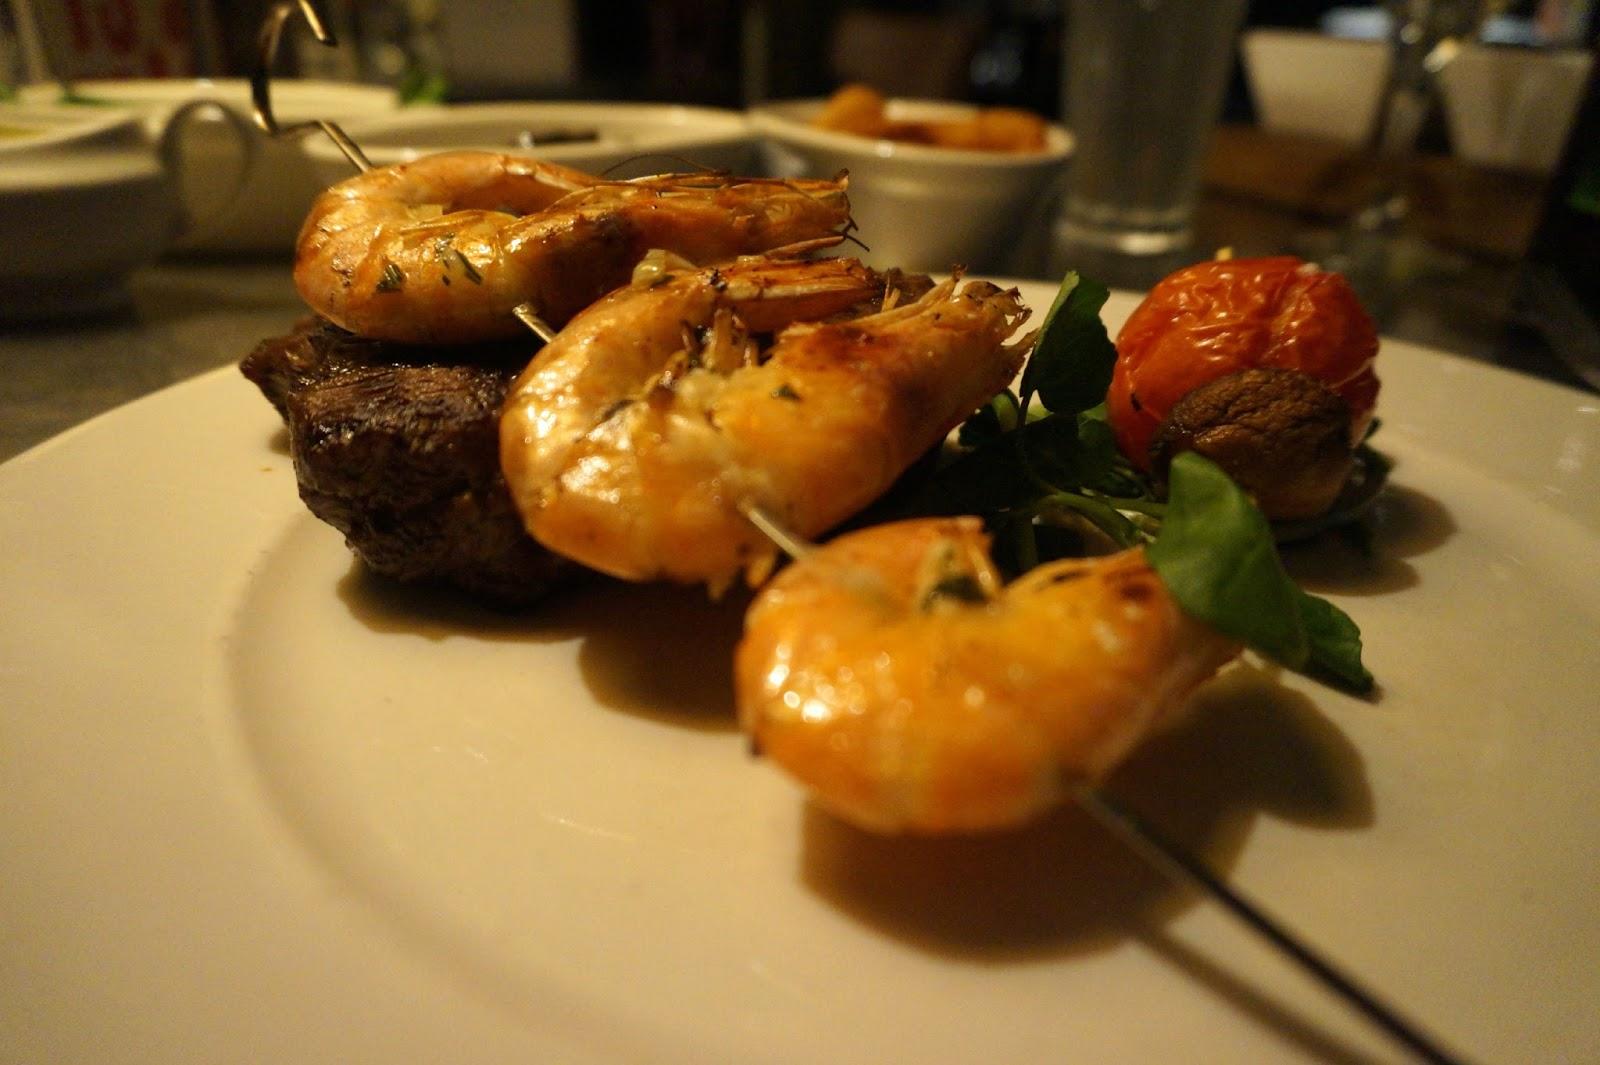 Steak with prawns on stick